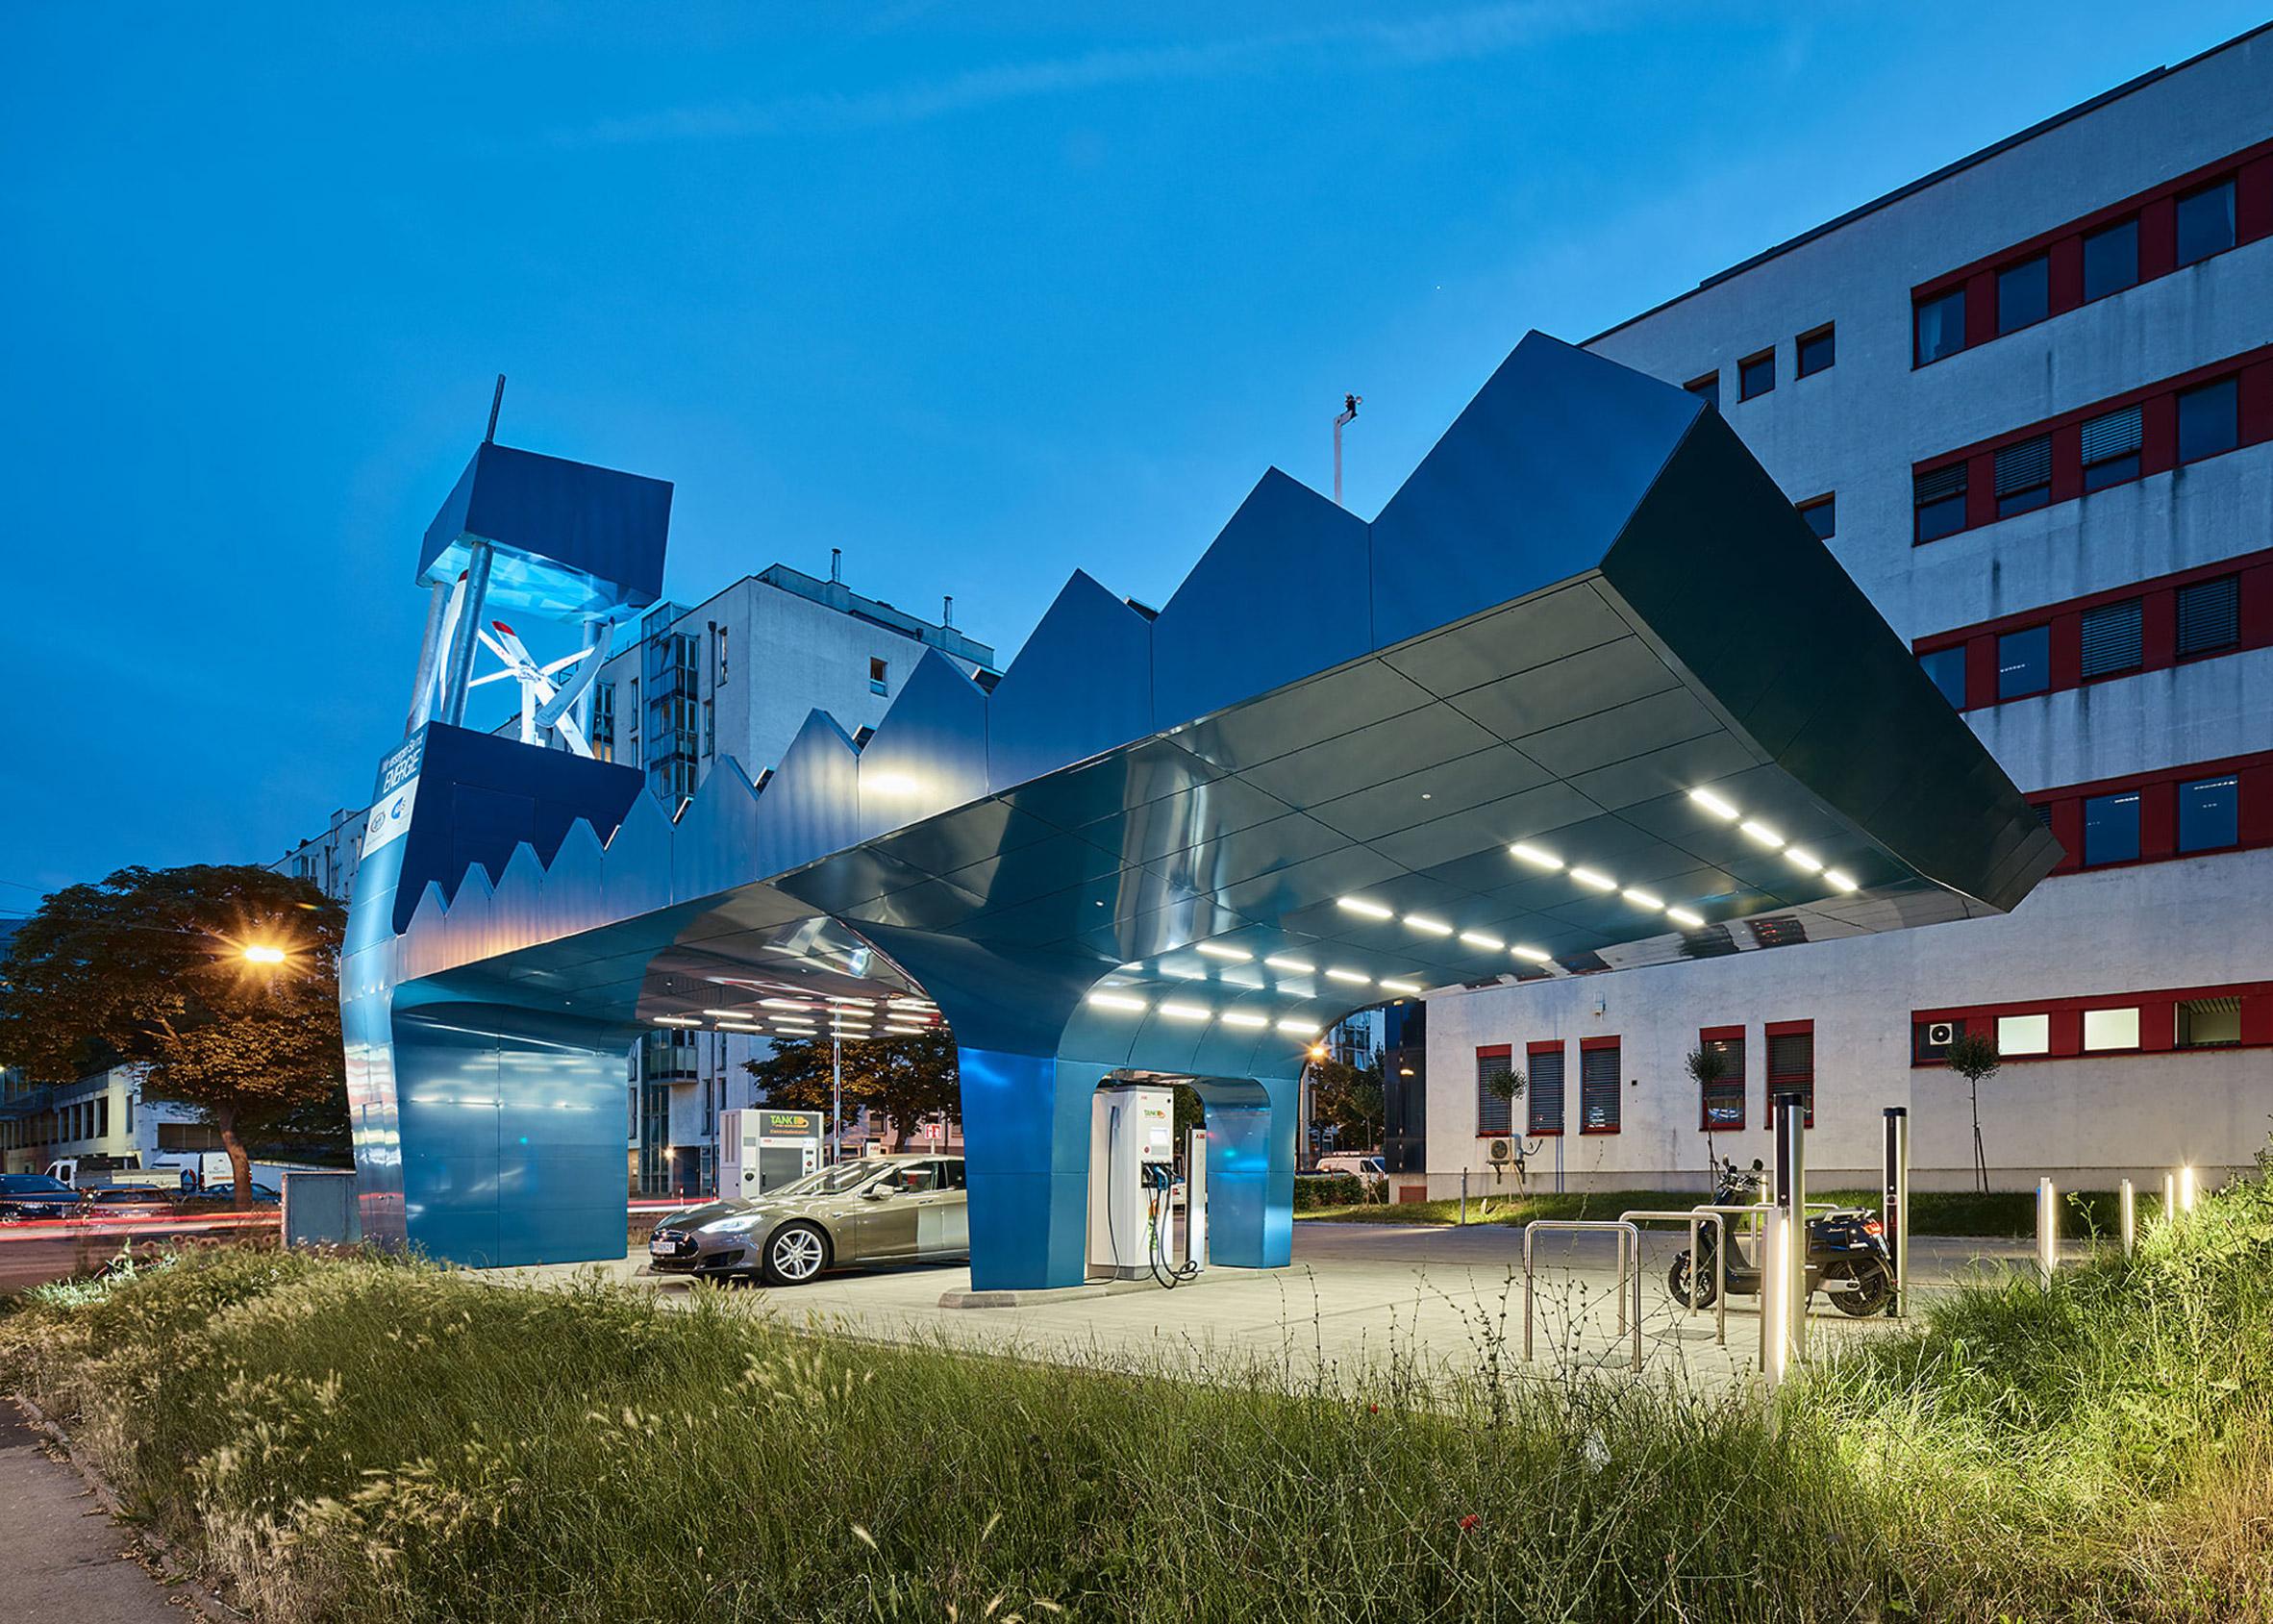 Dezeen Awards design winners: Tower of Power by Göbl architektur ZT GmbH